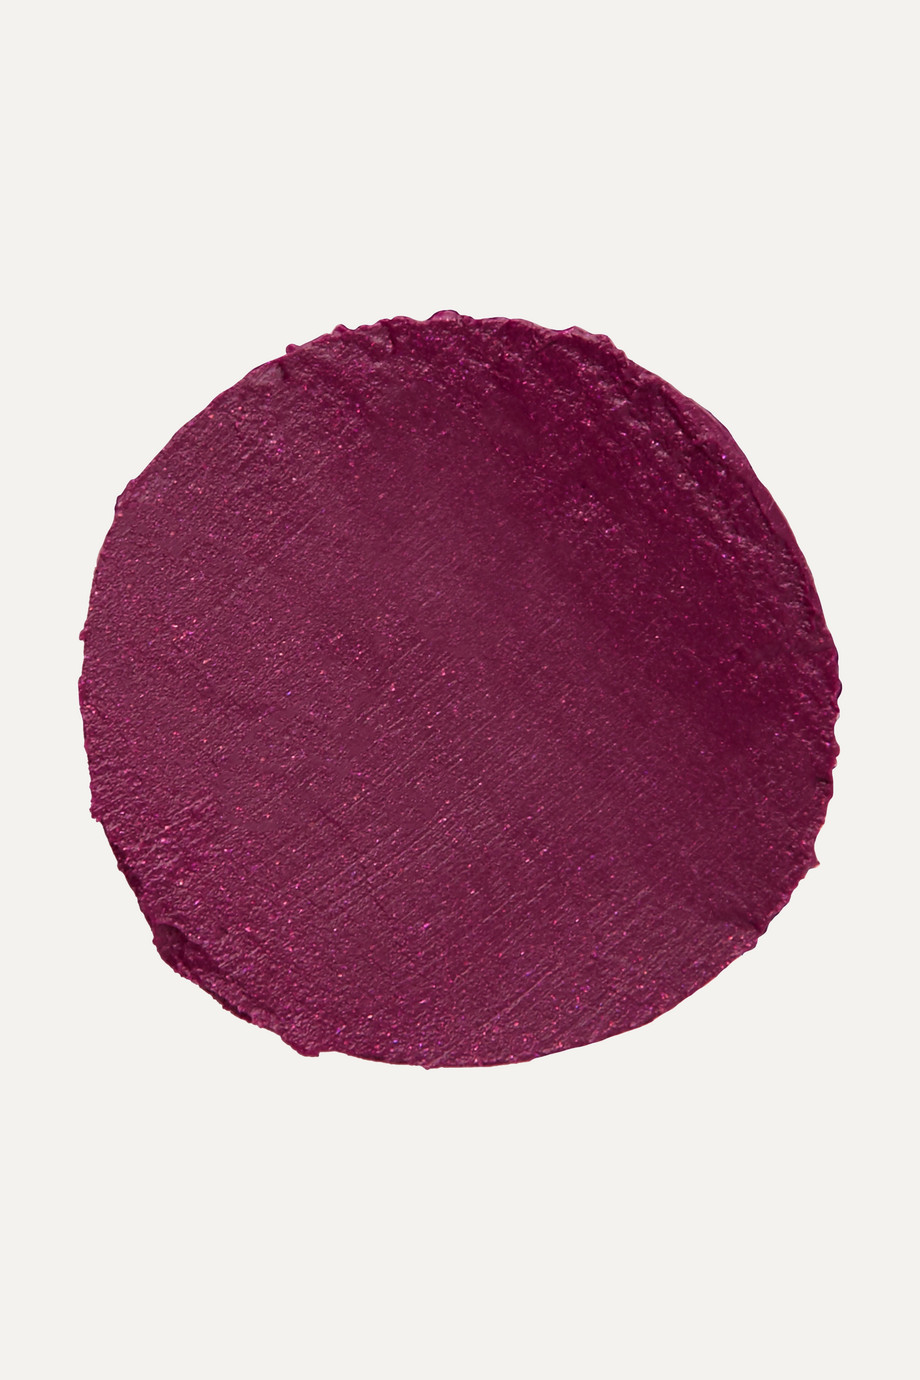 Serge Lutens Lipstick – Pourpre Maure 3 – Lippenstift